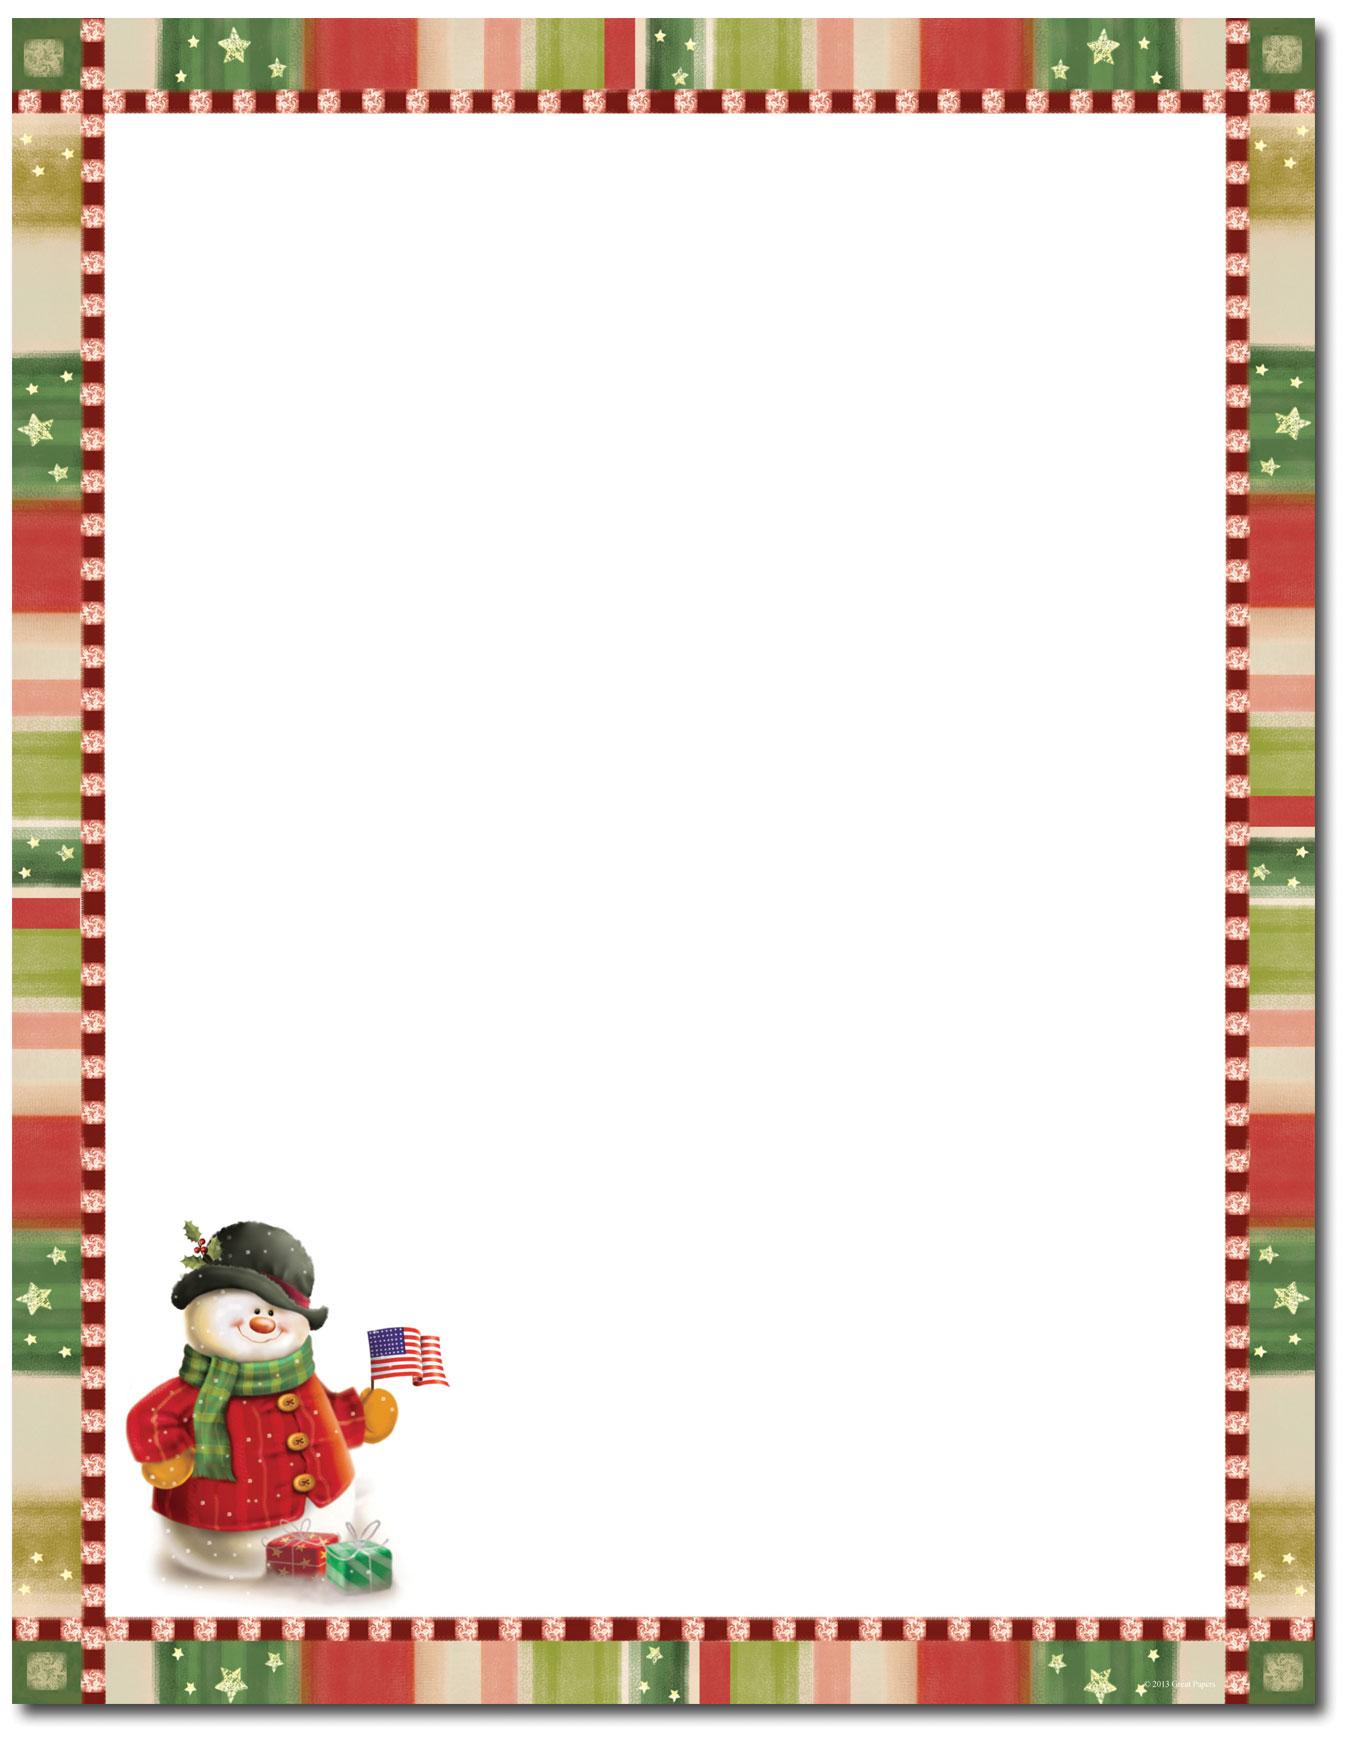 11610_5850_thumb Template Christmas Letterhead Border on letterhead text templates, stationery border templates, holiday border templates, holiday letterhead templates,